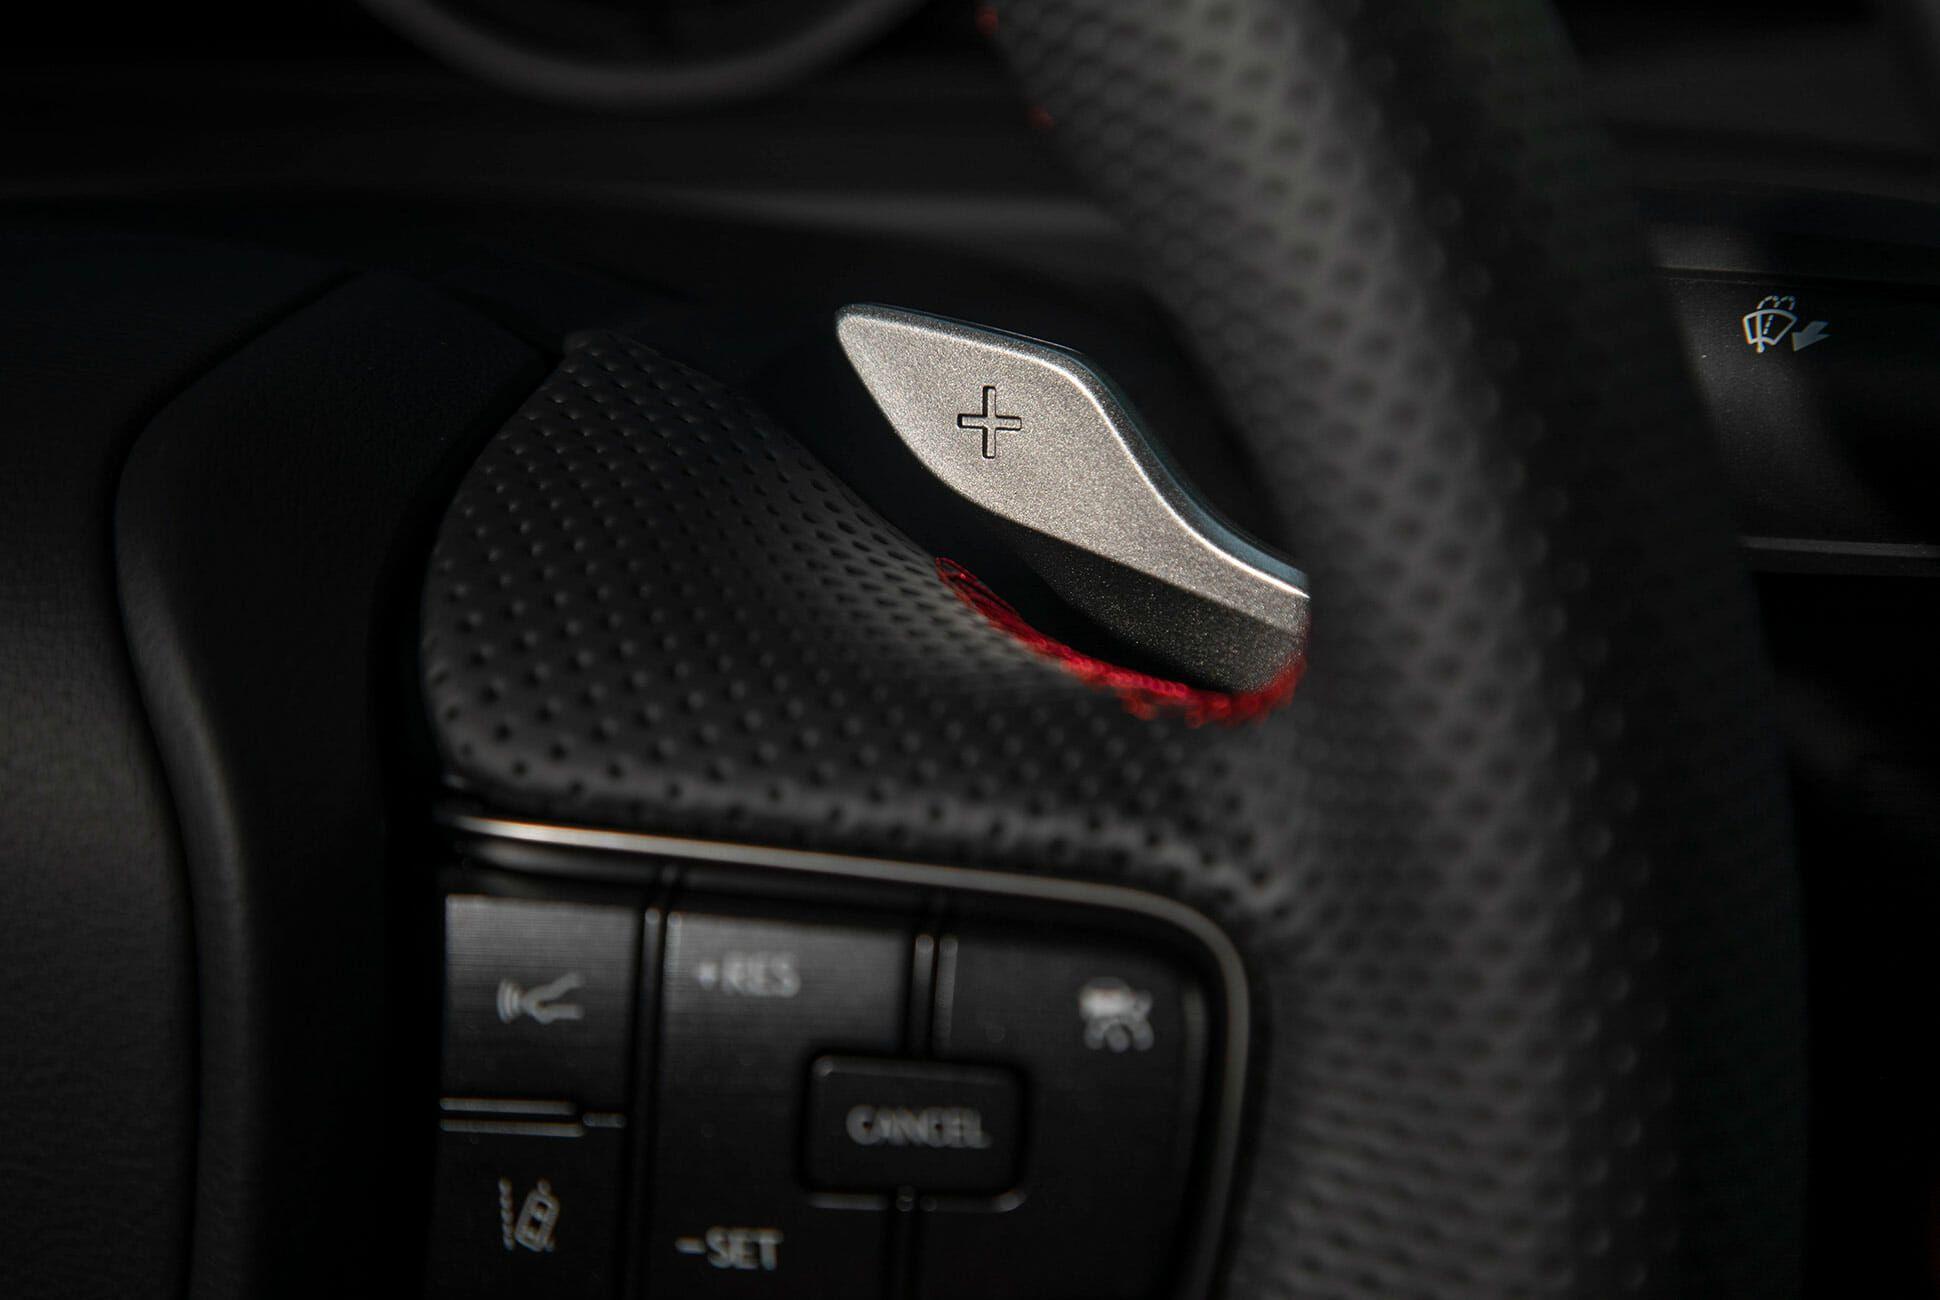 2019-Lexus-ES-350-F-Sport-Review-gear-patrol-slide-14